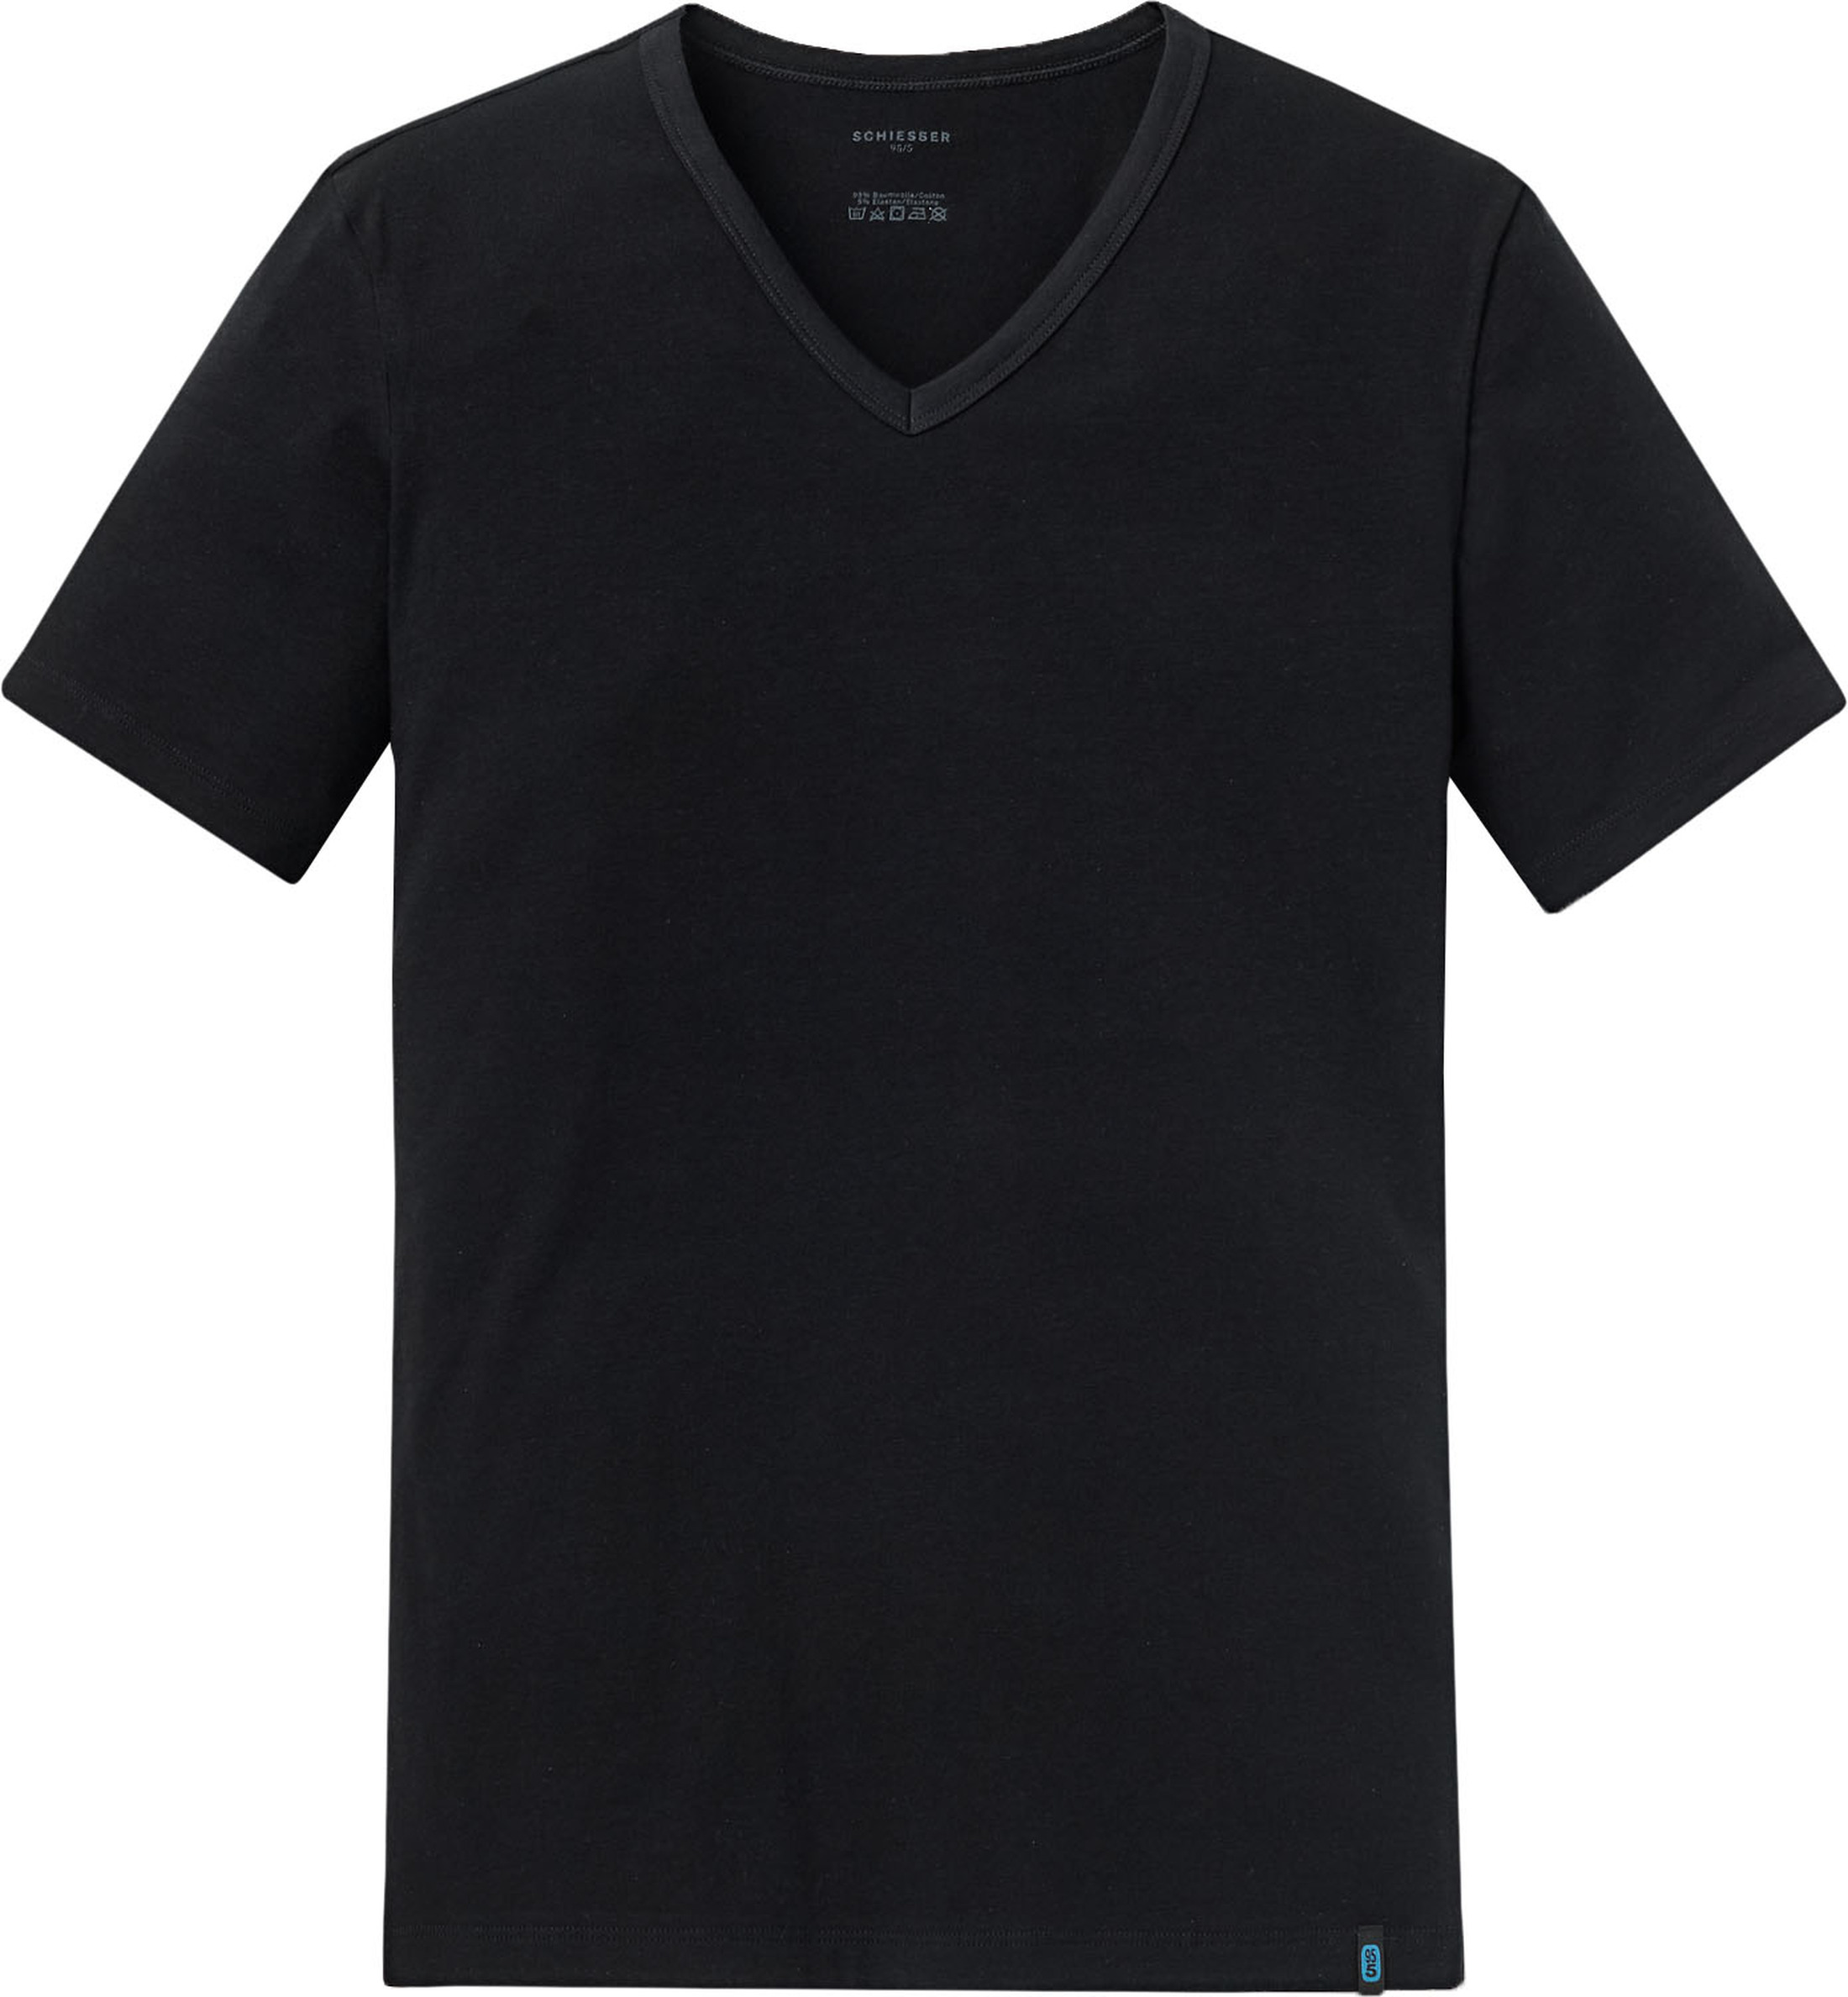 Schiesser T-shirt V-Neck Black